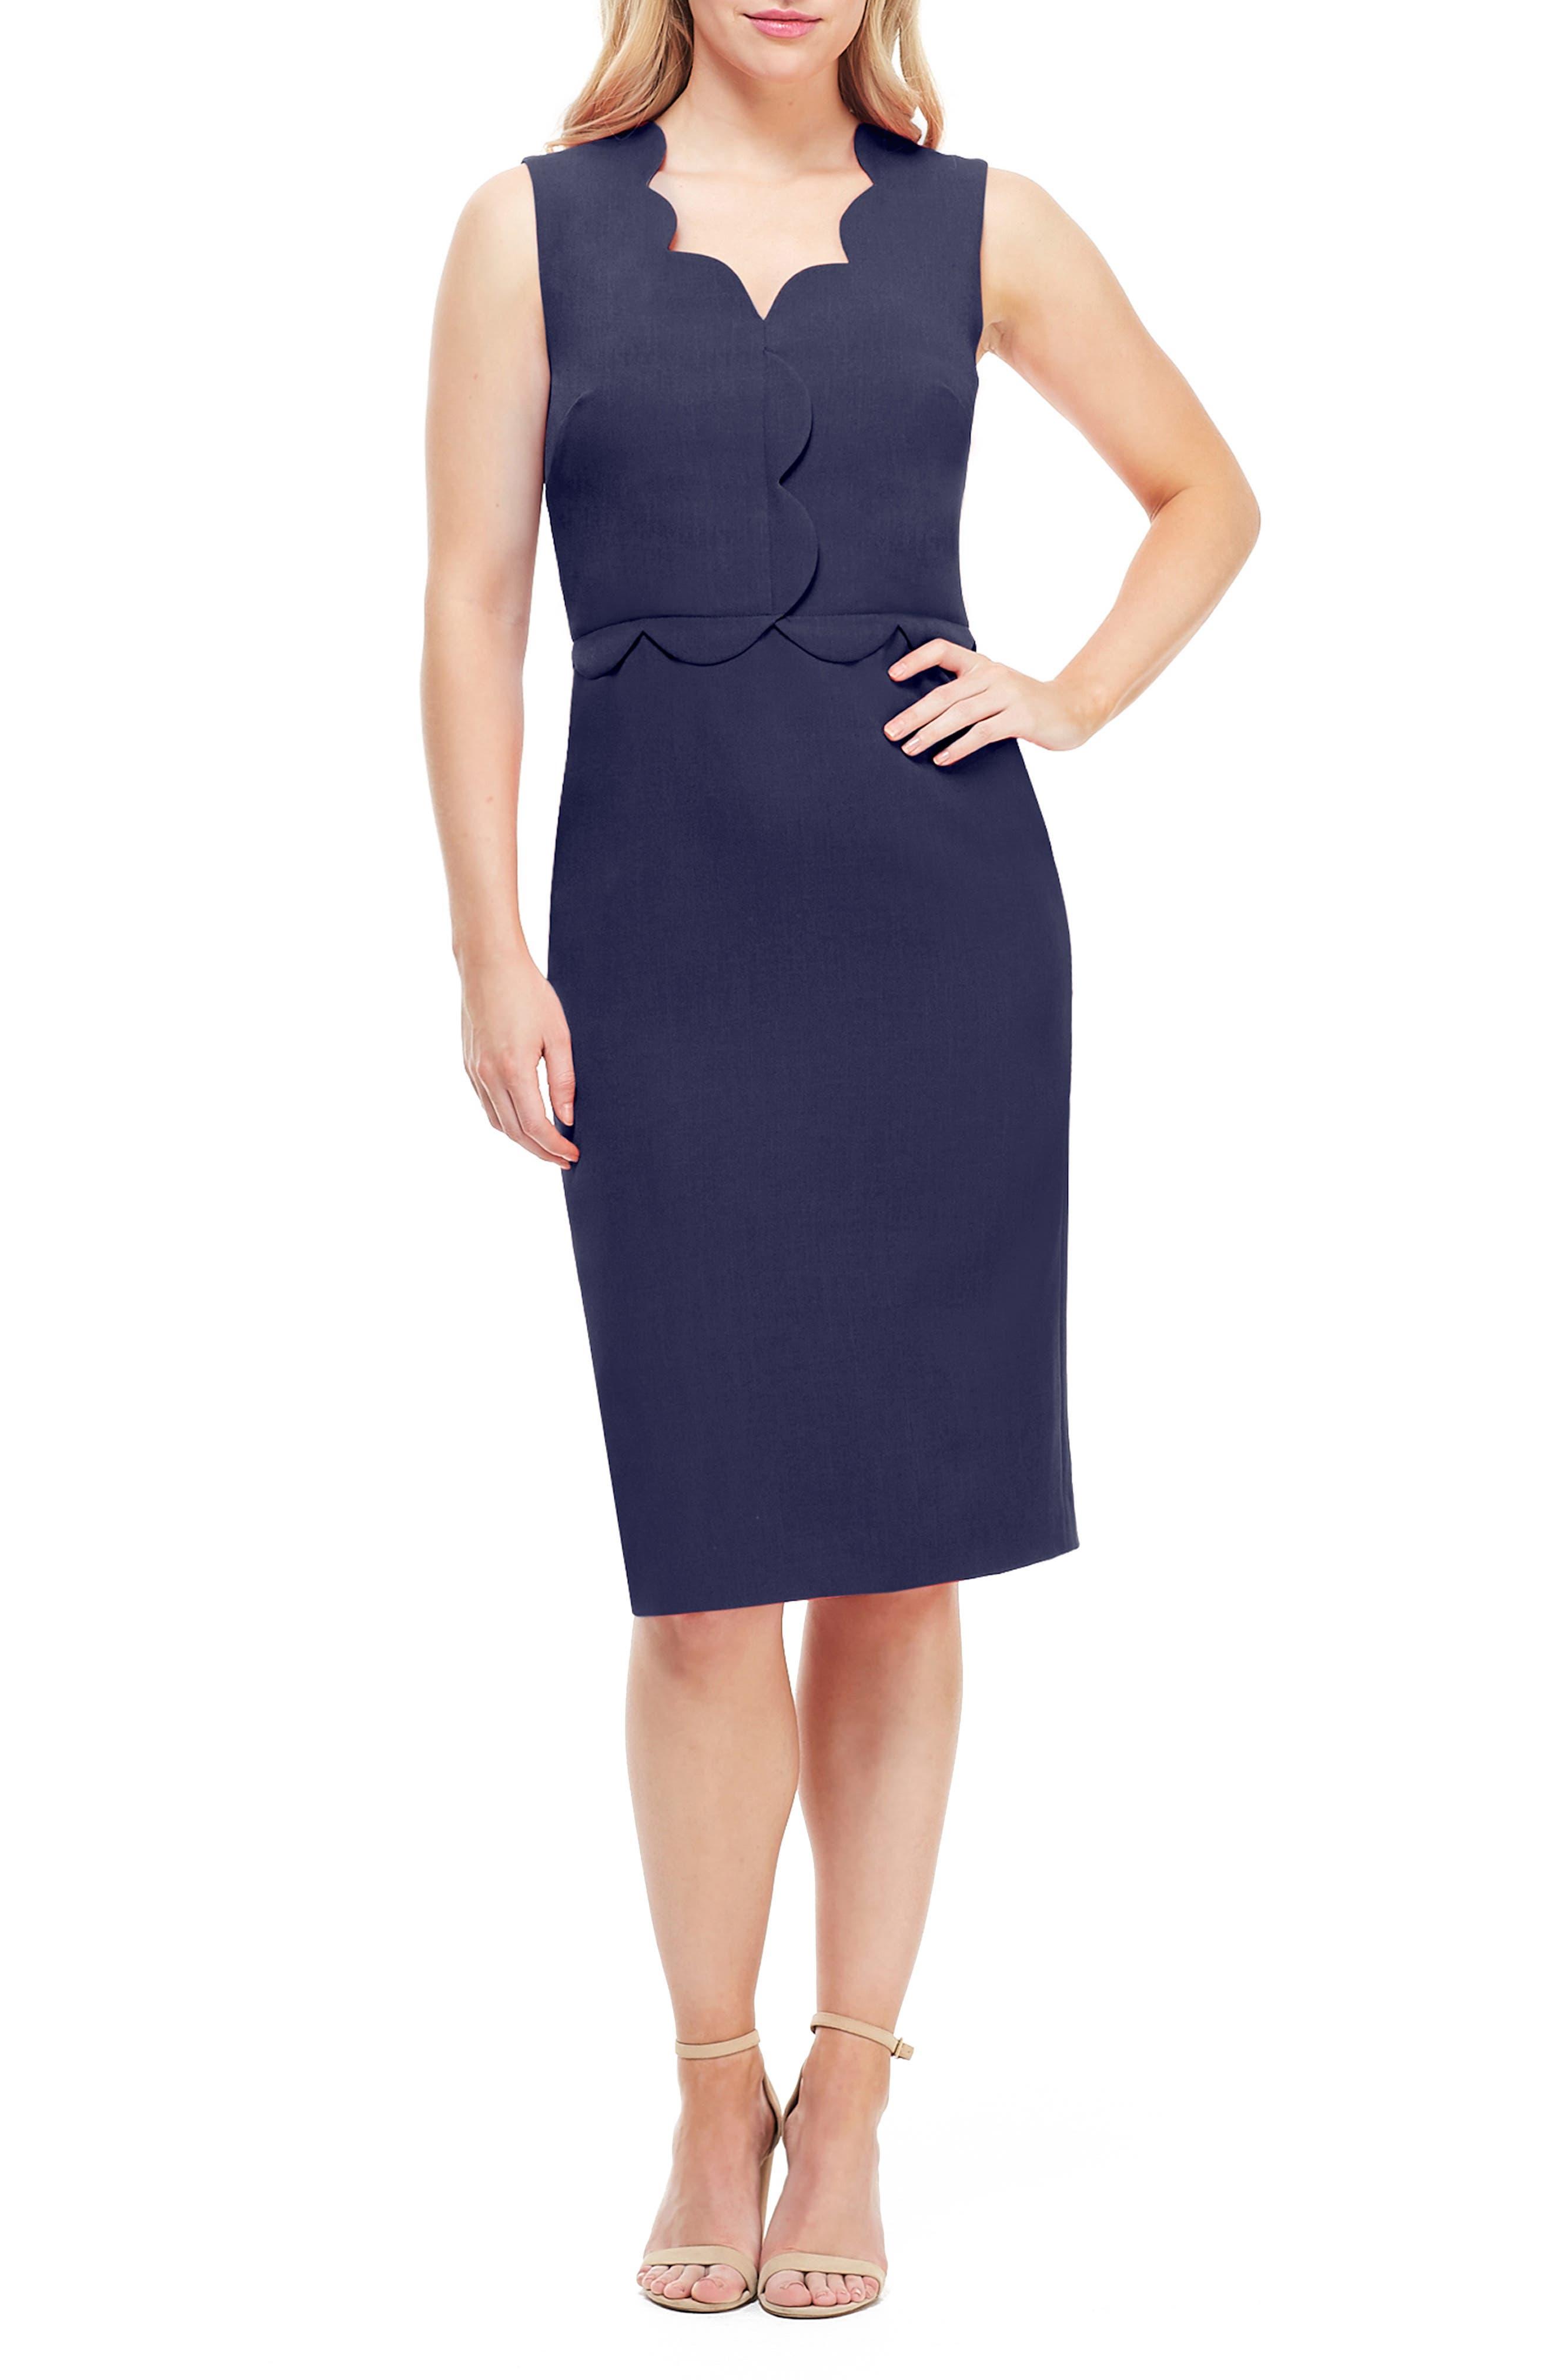 1950s Pencil Dresses & Wiggle Dress Styles Womens Maggy London Scallop Sheath Dress Size 8 - Blue $76.80 AT vintagedancer.com